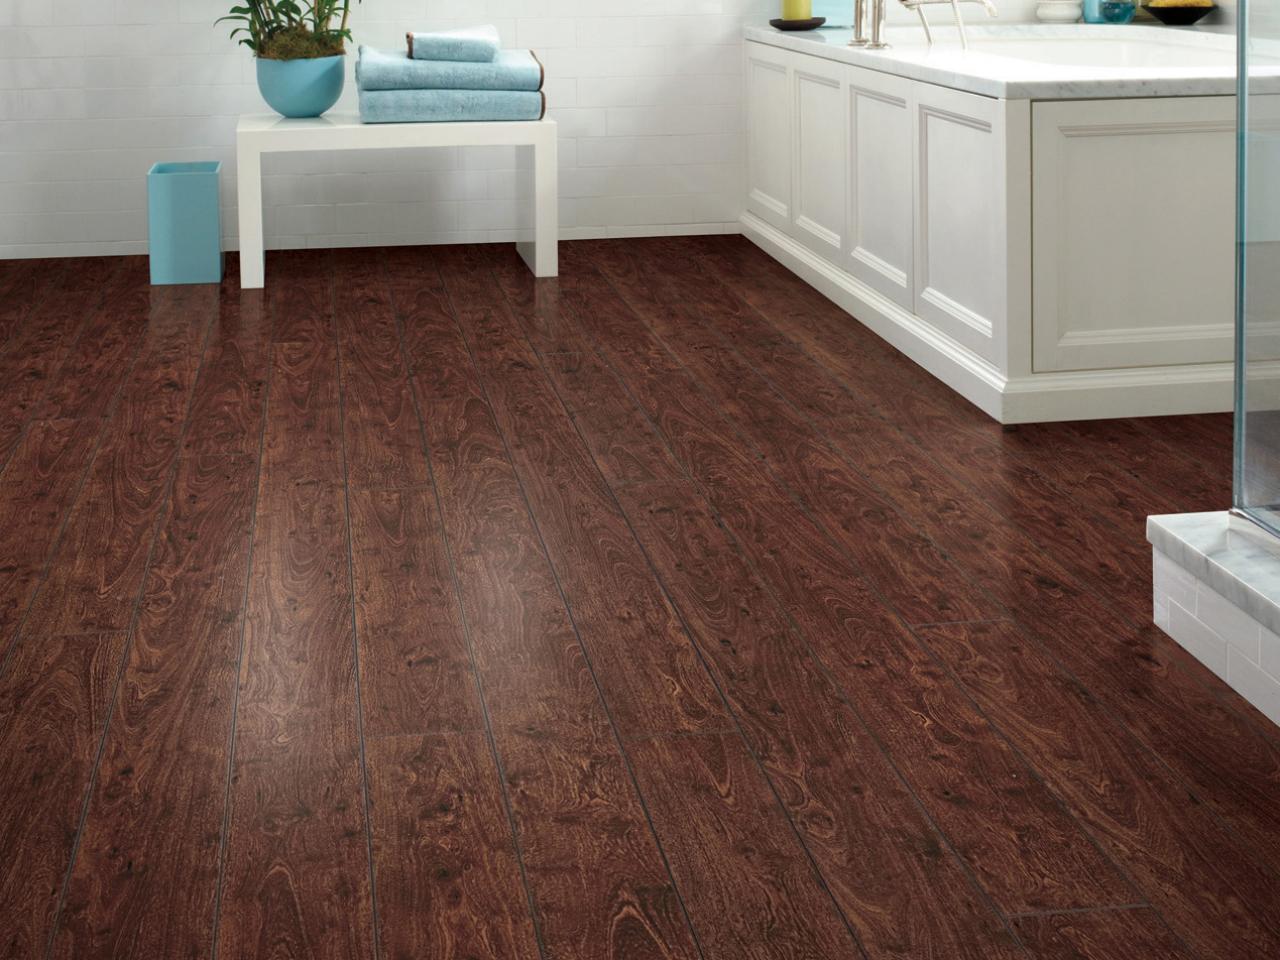 Laminate flooring options laminate flooring for basements GZDGNAD